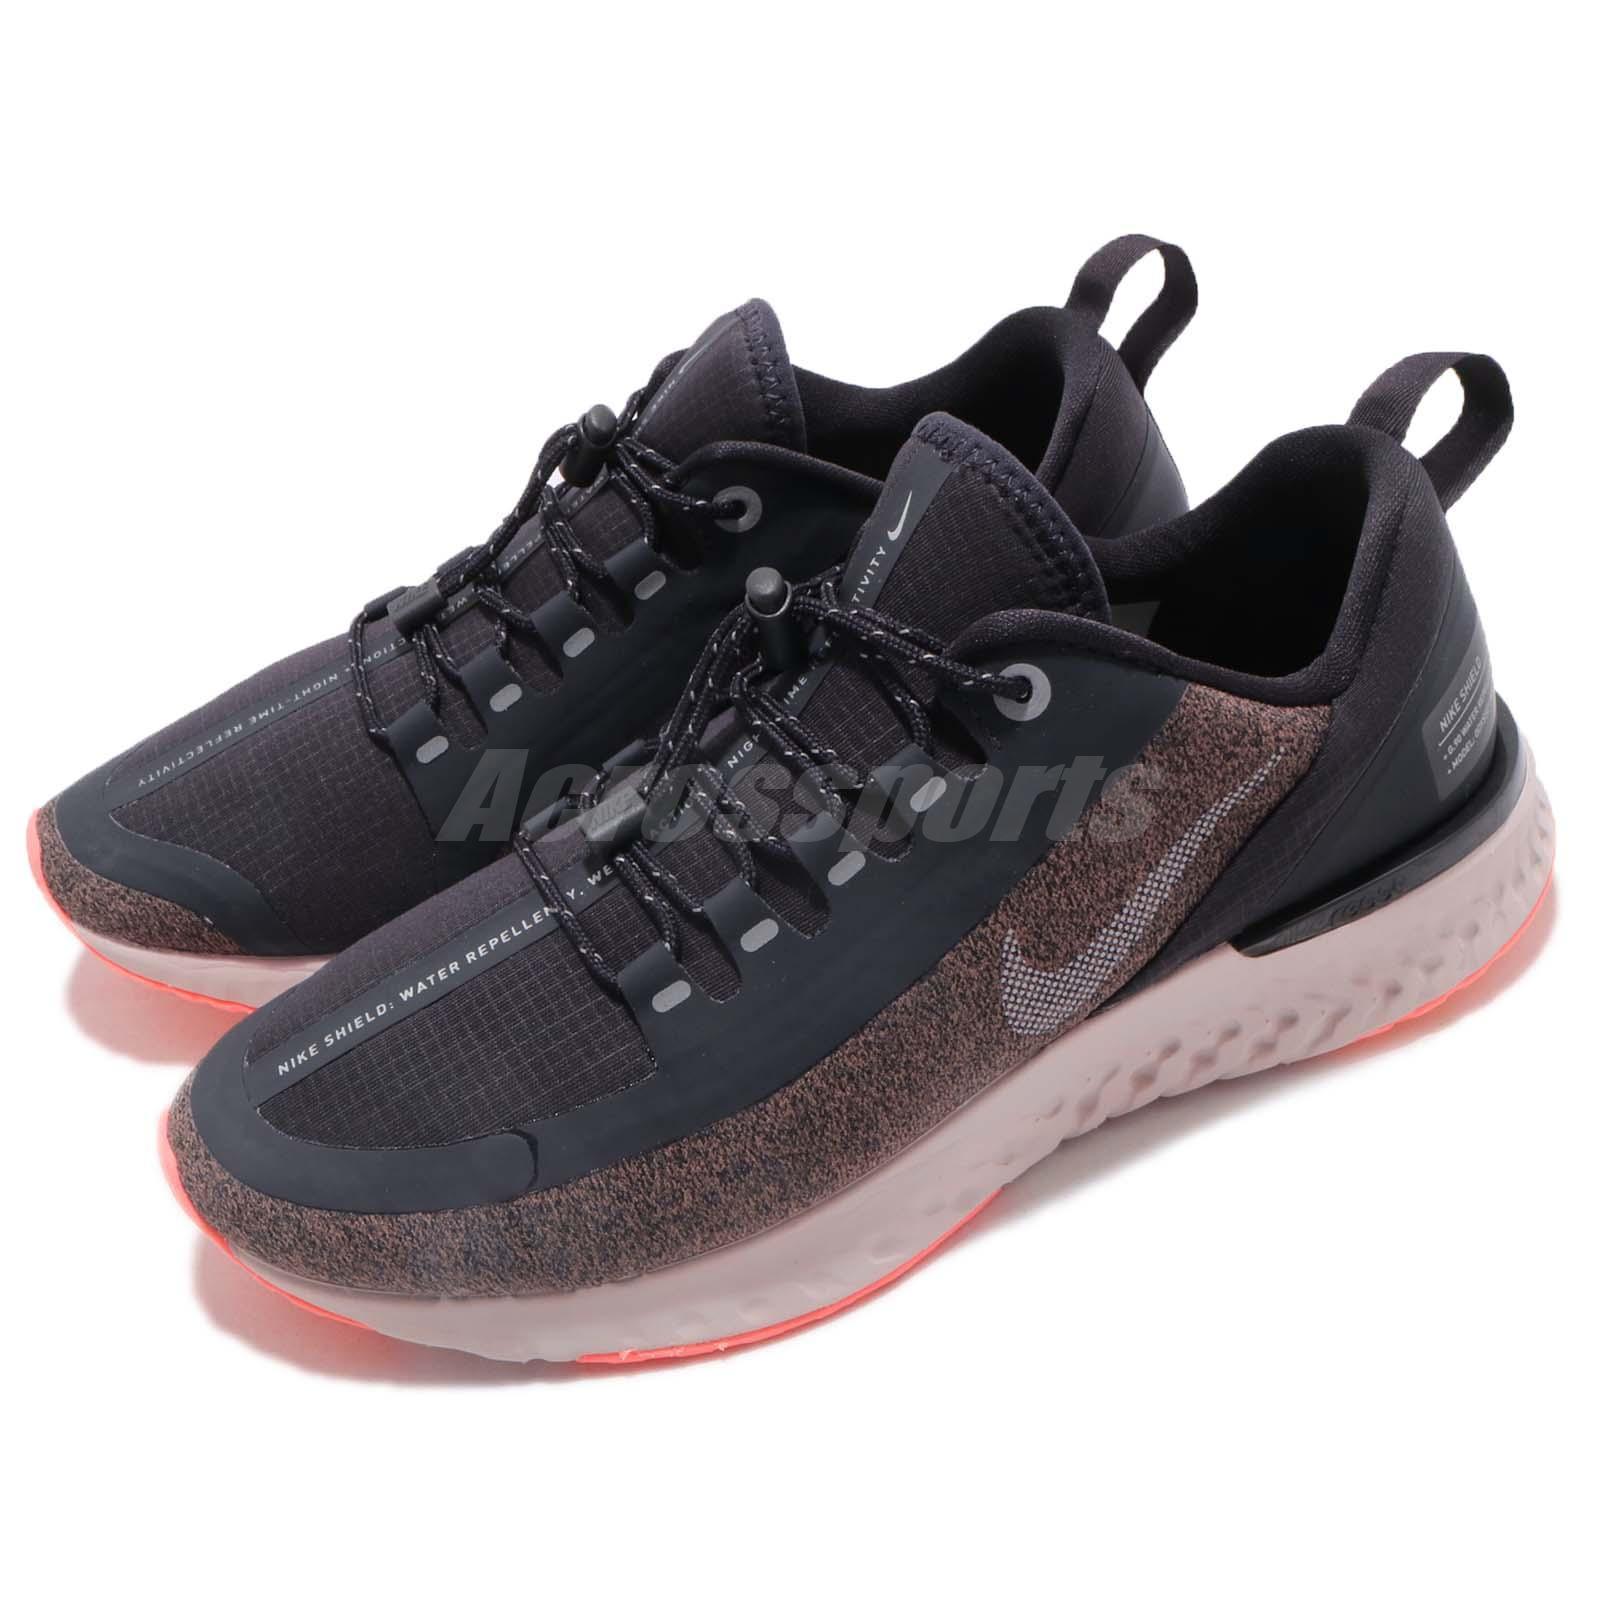 25a3568d8430b Detalles acerca de Nike Wmns odisea reaccionar Escudo Aceite Gris Plata  Mujeres Tenis para Correr AA1635-002- mostrar título original